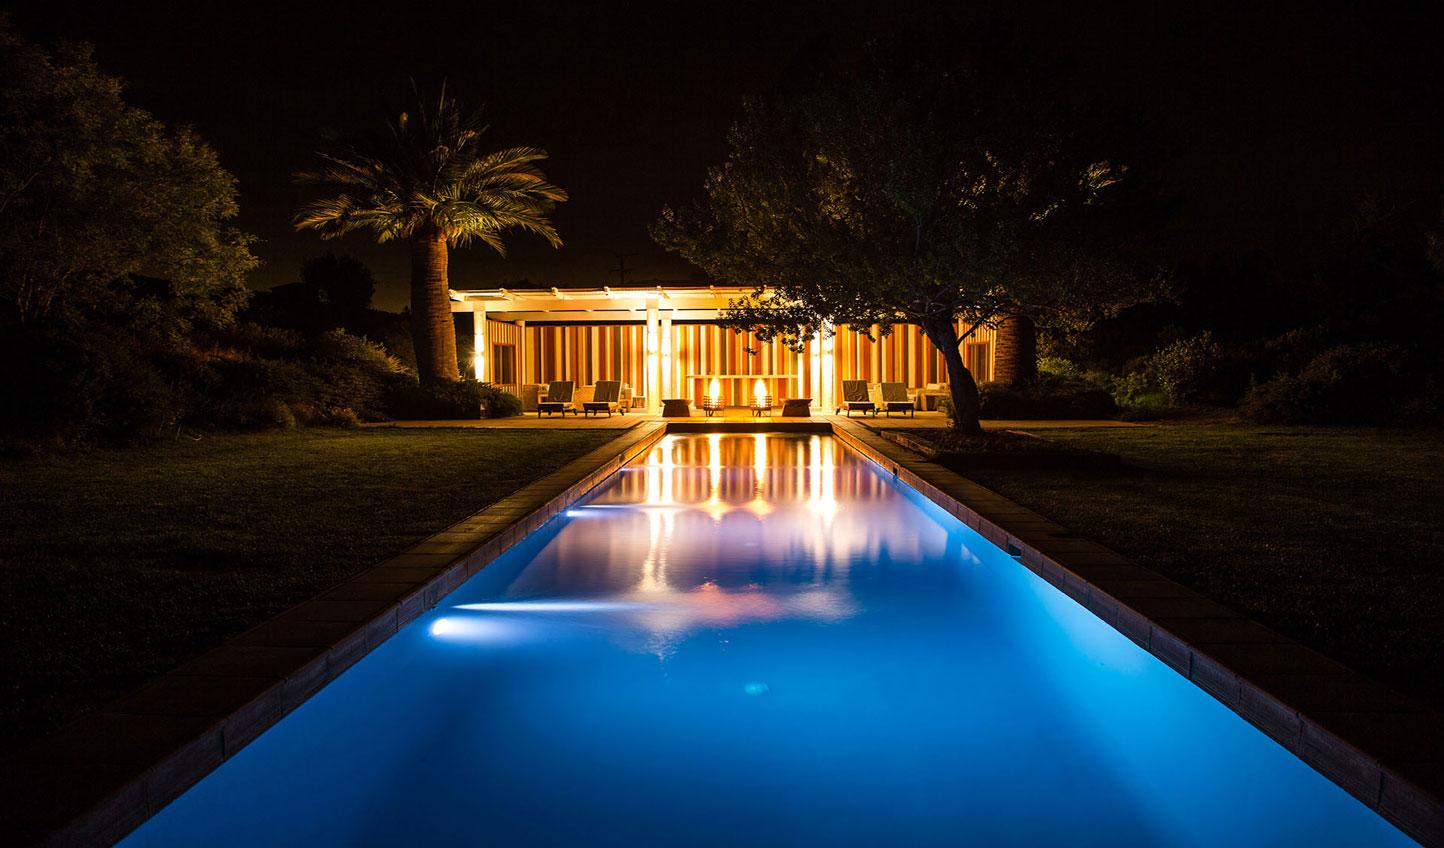 La Casona pool at night